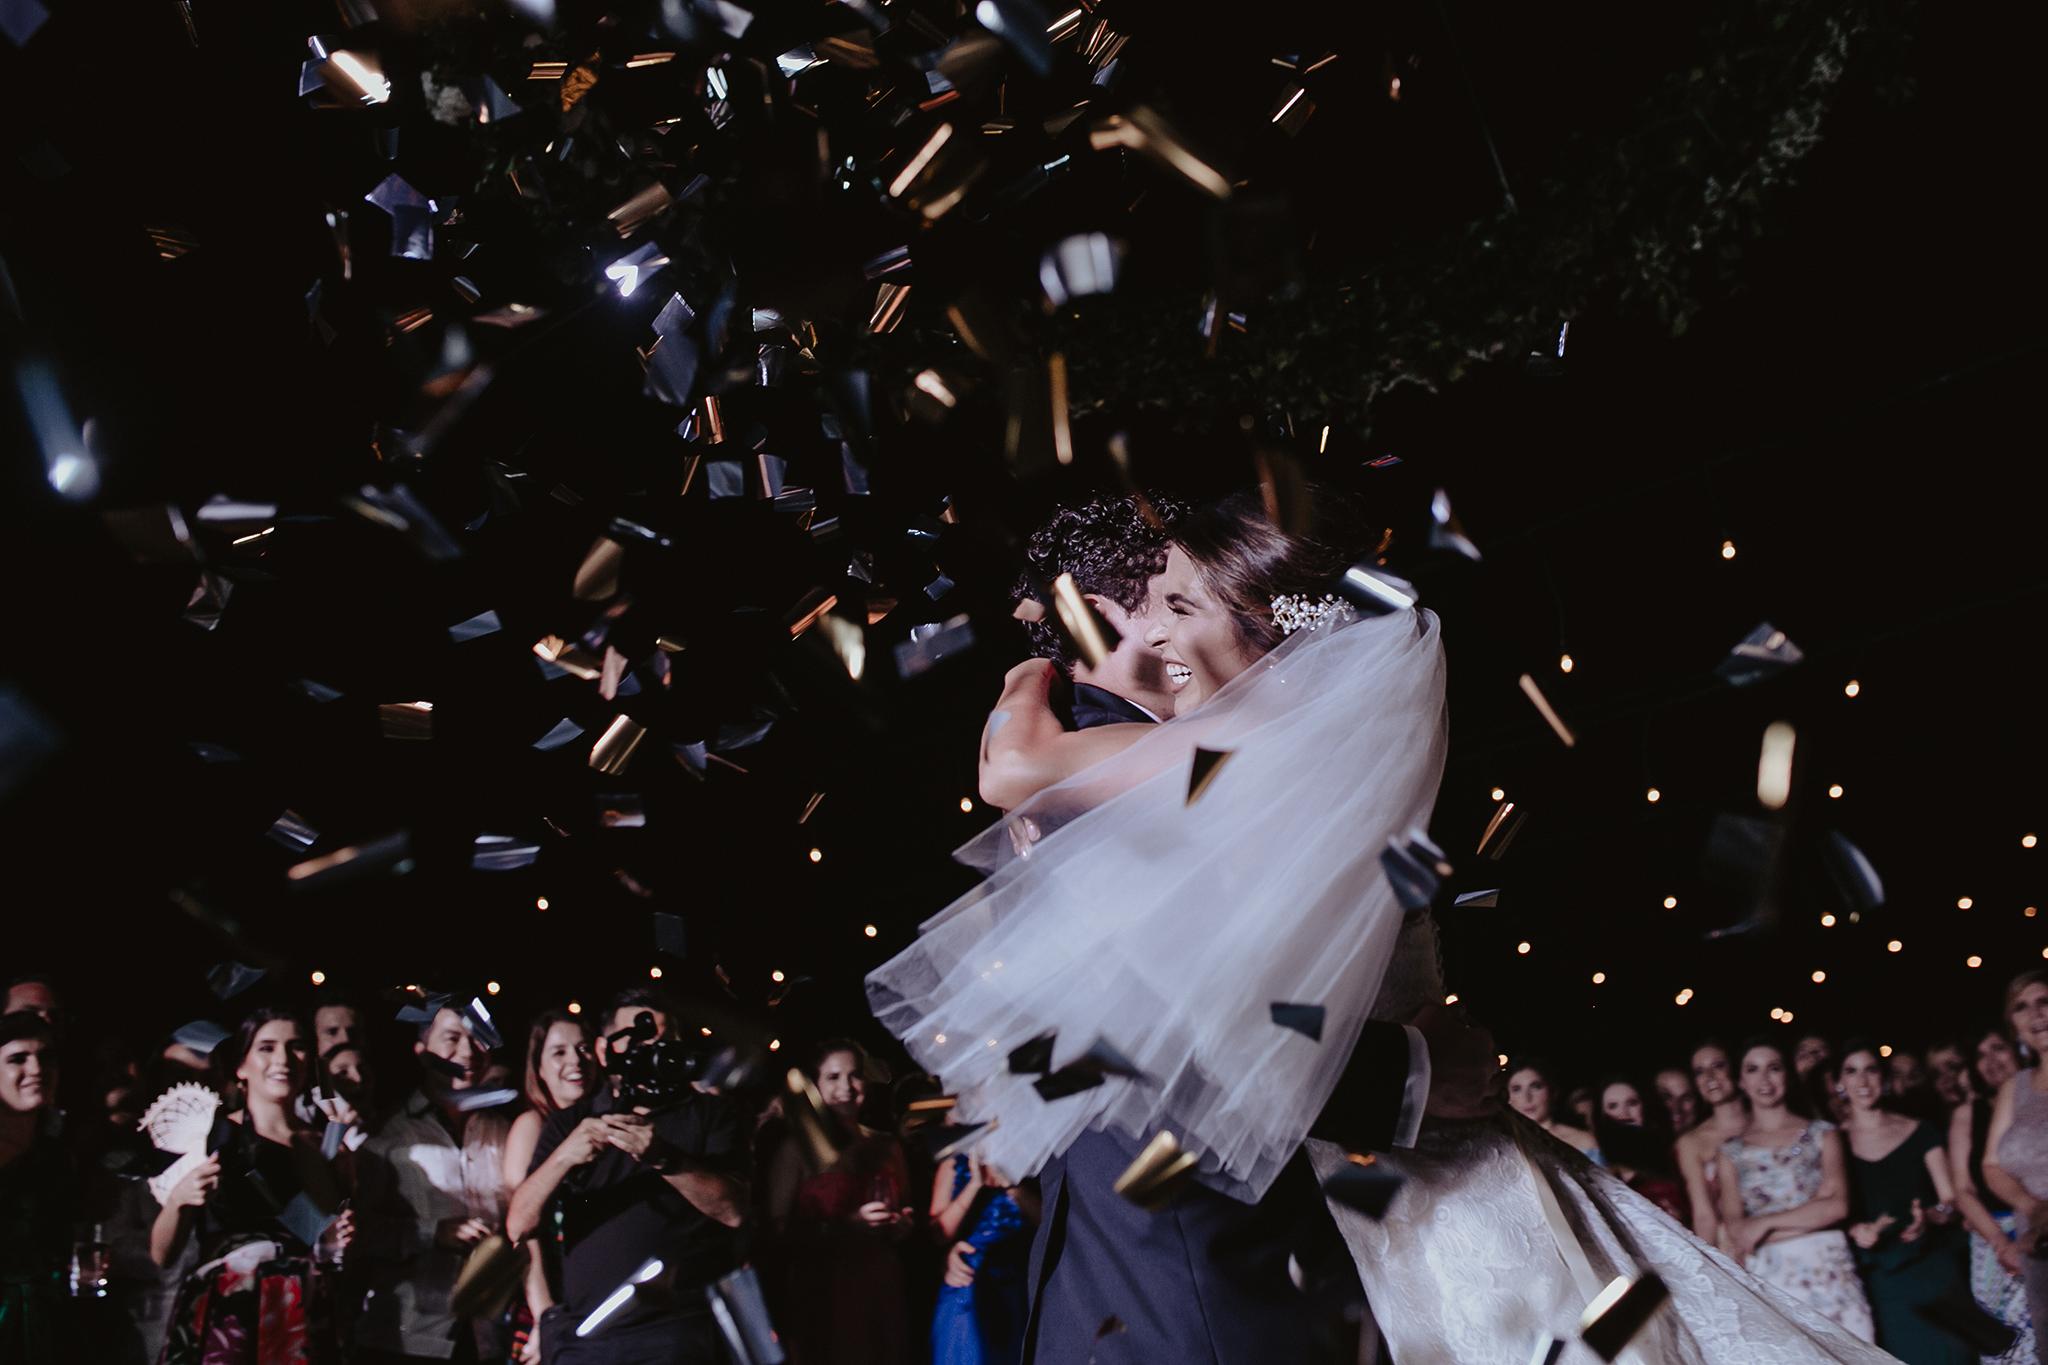 0361F&Yslide_WeddingDstination_MeridaYucatan_HaciendasMerida_BodasMexico_BodasYucatan_Boda_Destino.jpg